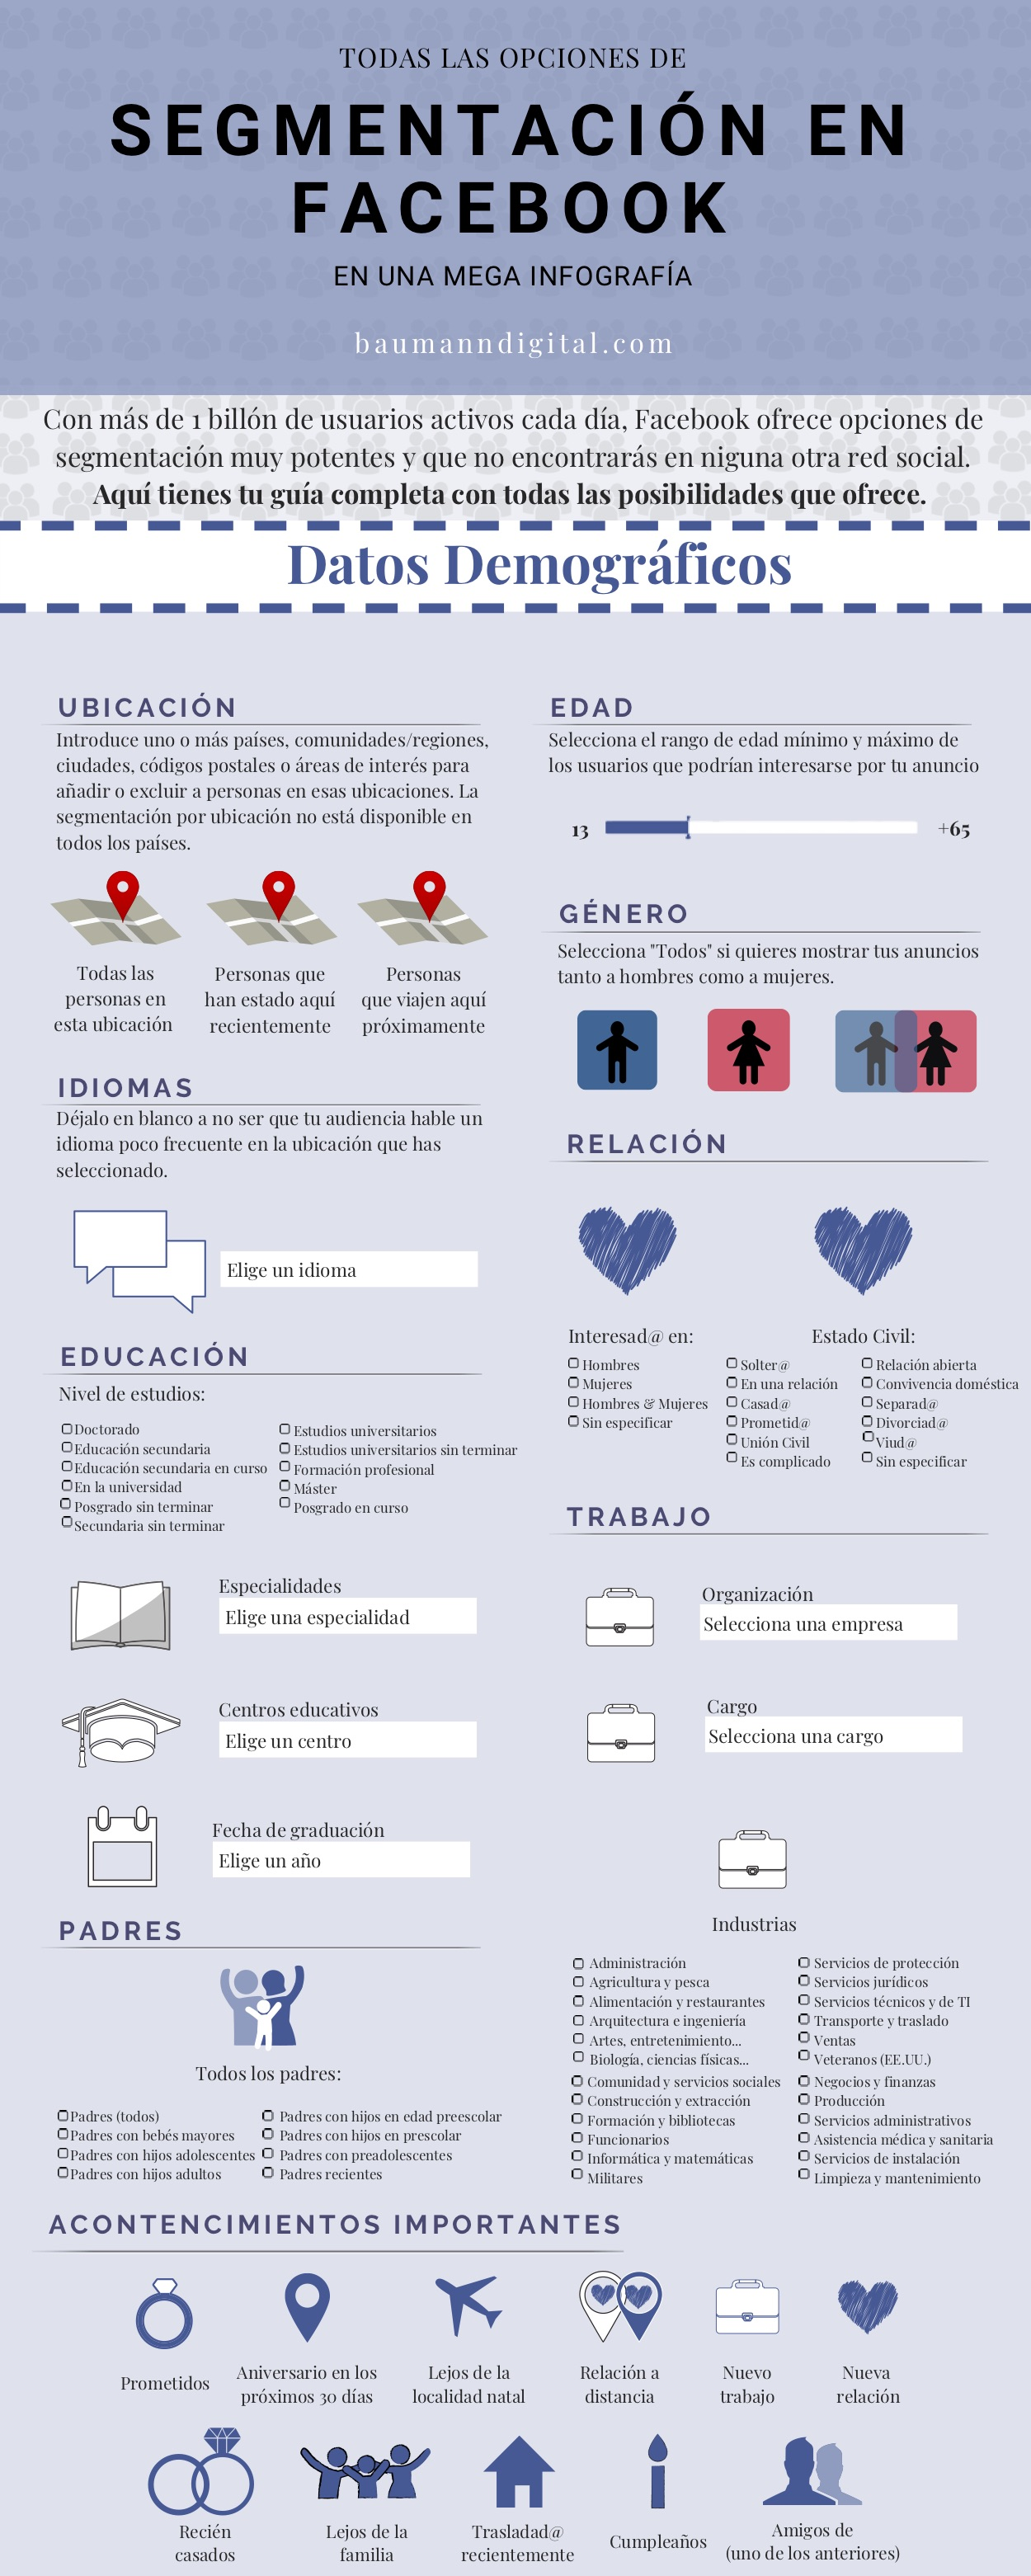 segmentacion-facebook-infografia